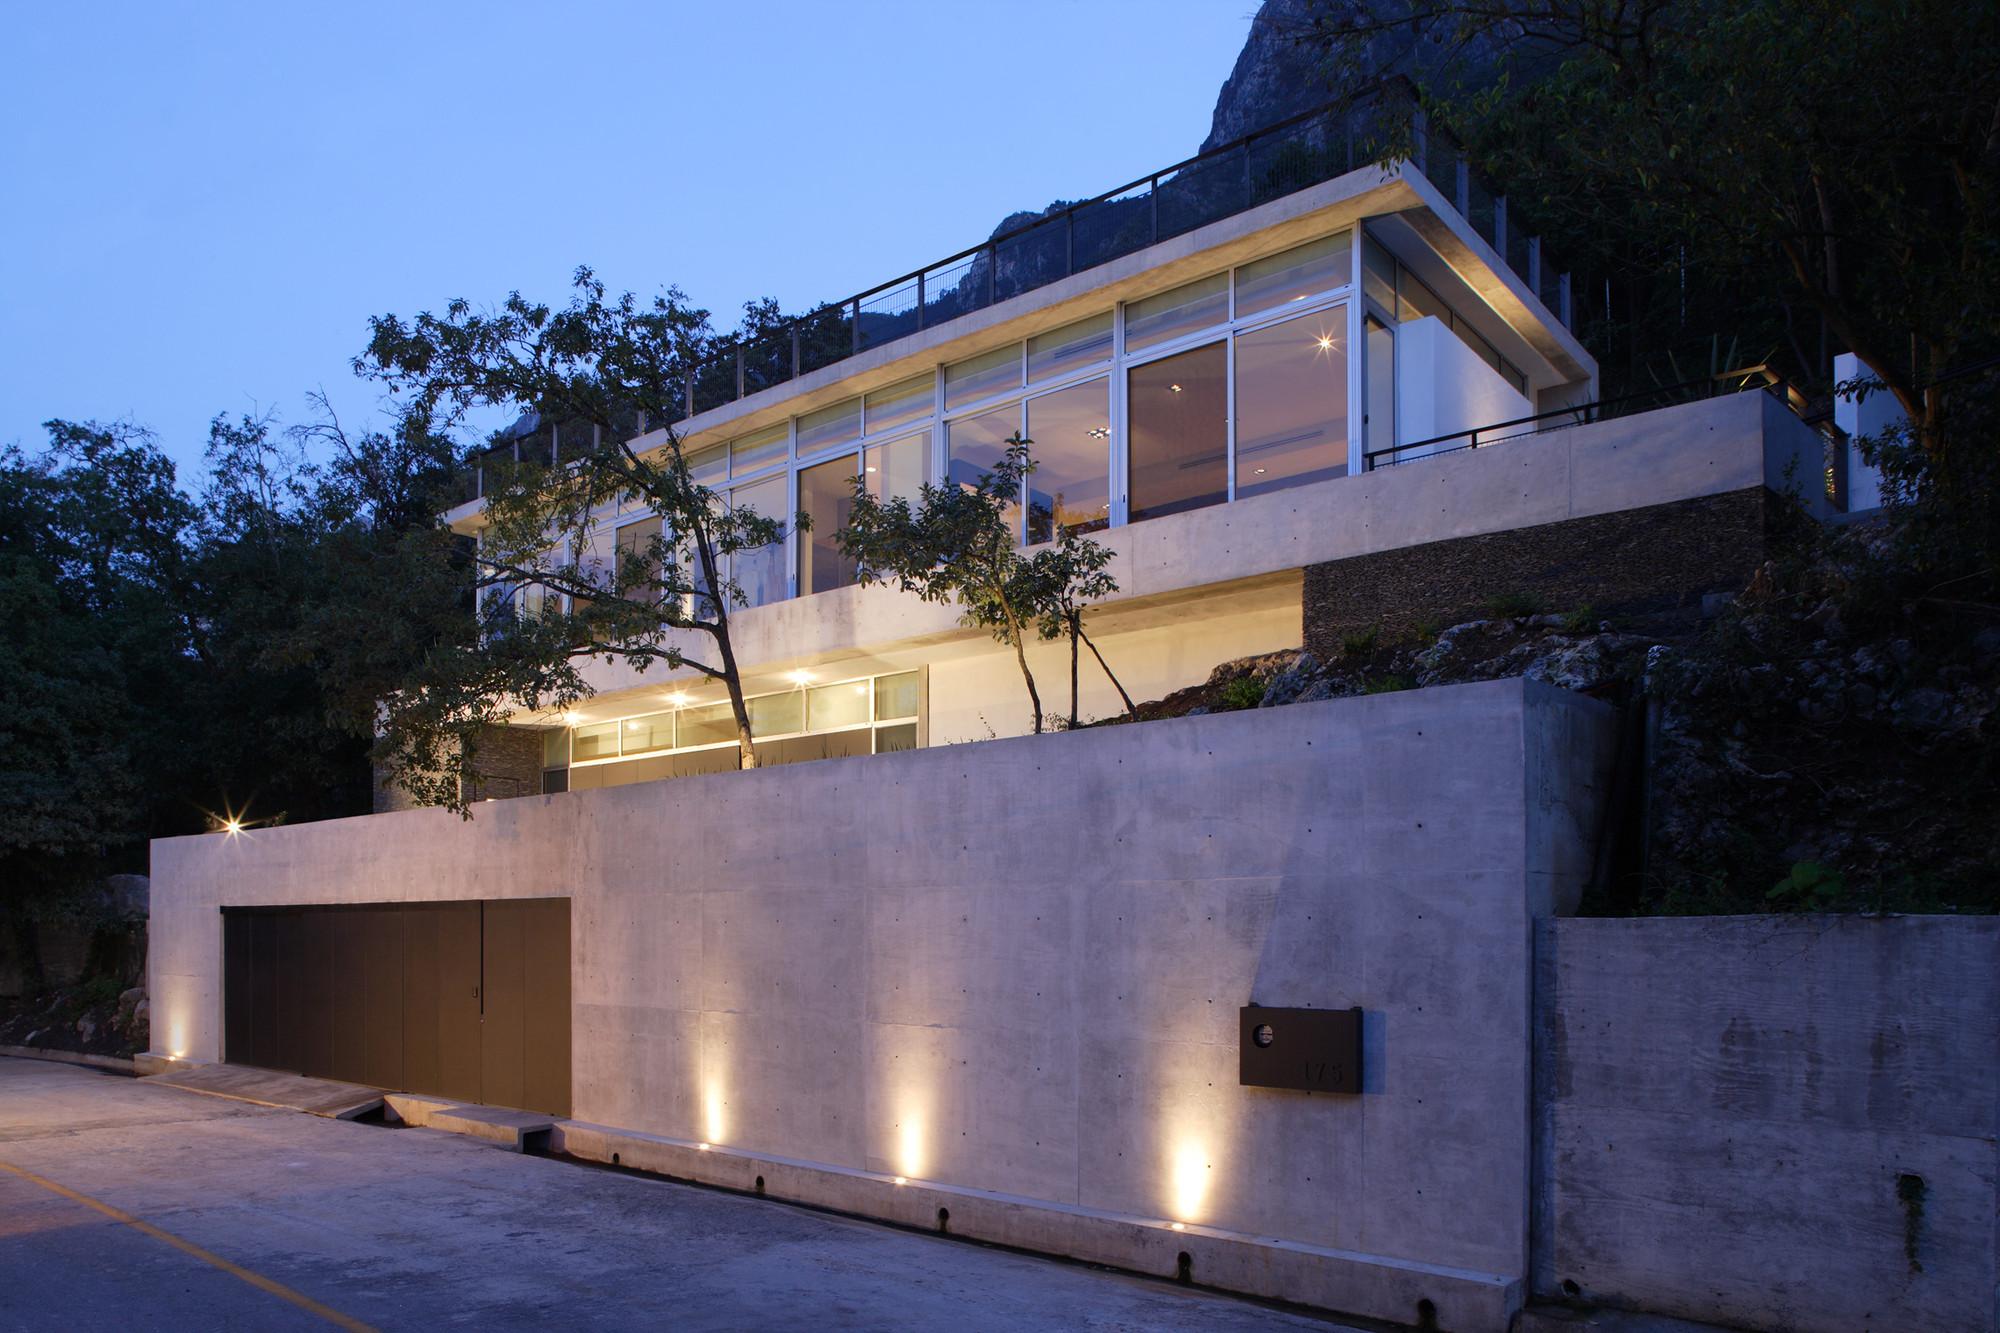 Residencia MB2 / LeNoir & Asoc. Estudio de Arquitectura, © Eduardo Alarcón Ceballos